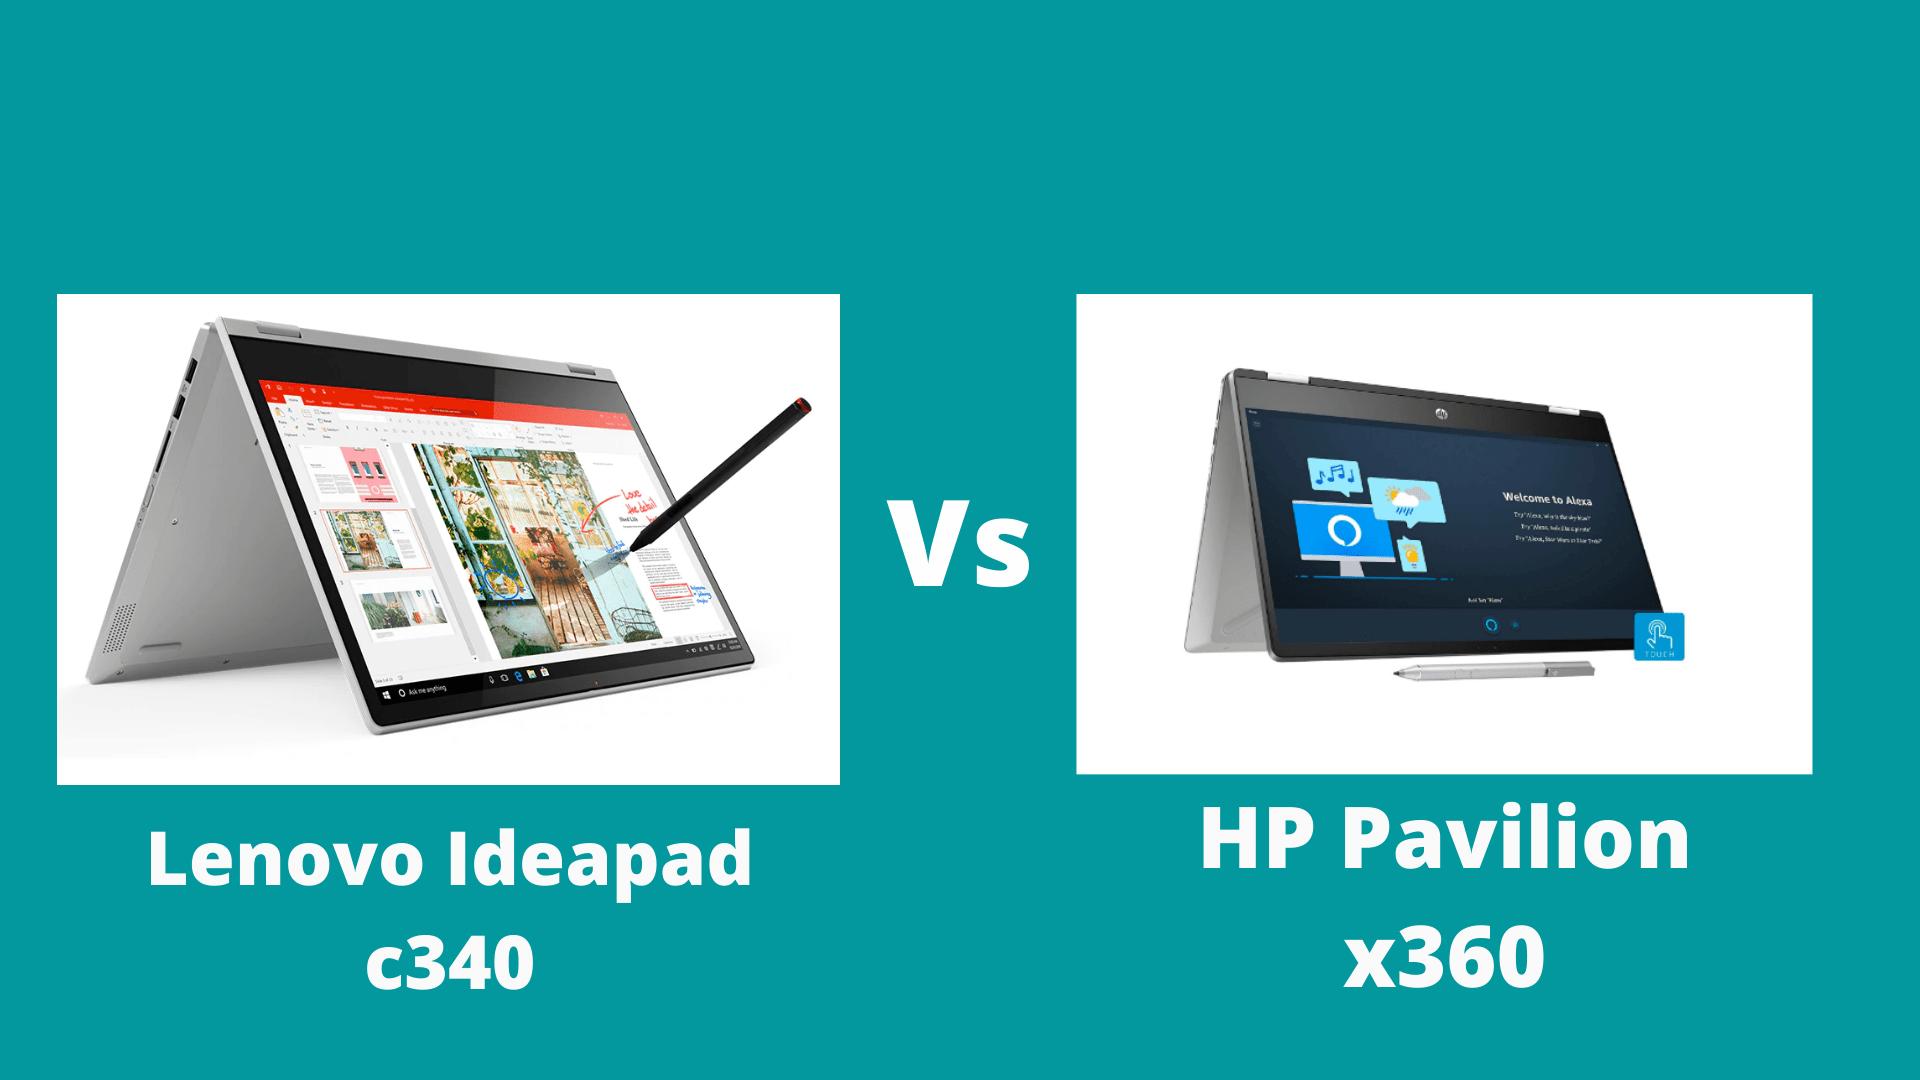 HP Pavilion x360 vs Lenovo Ideapad c340 (2020)